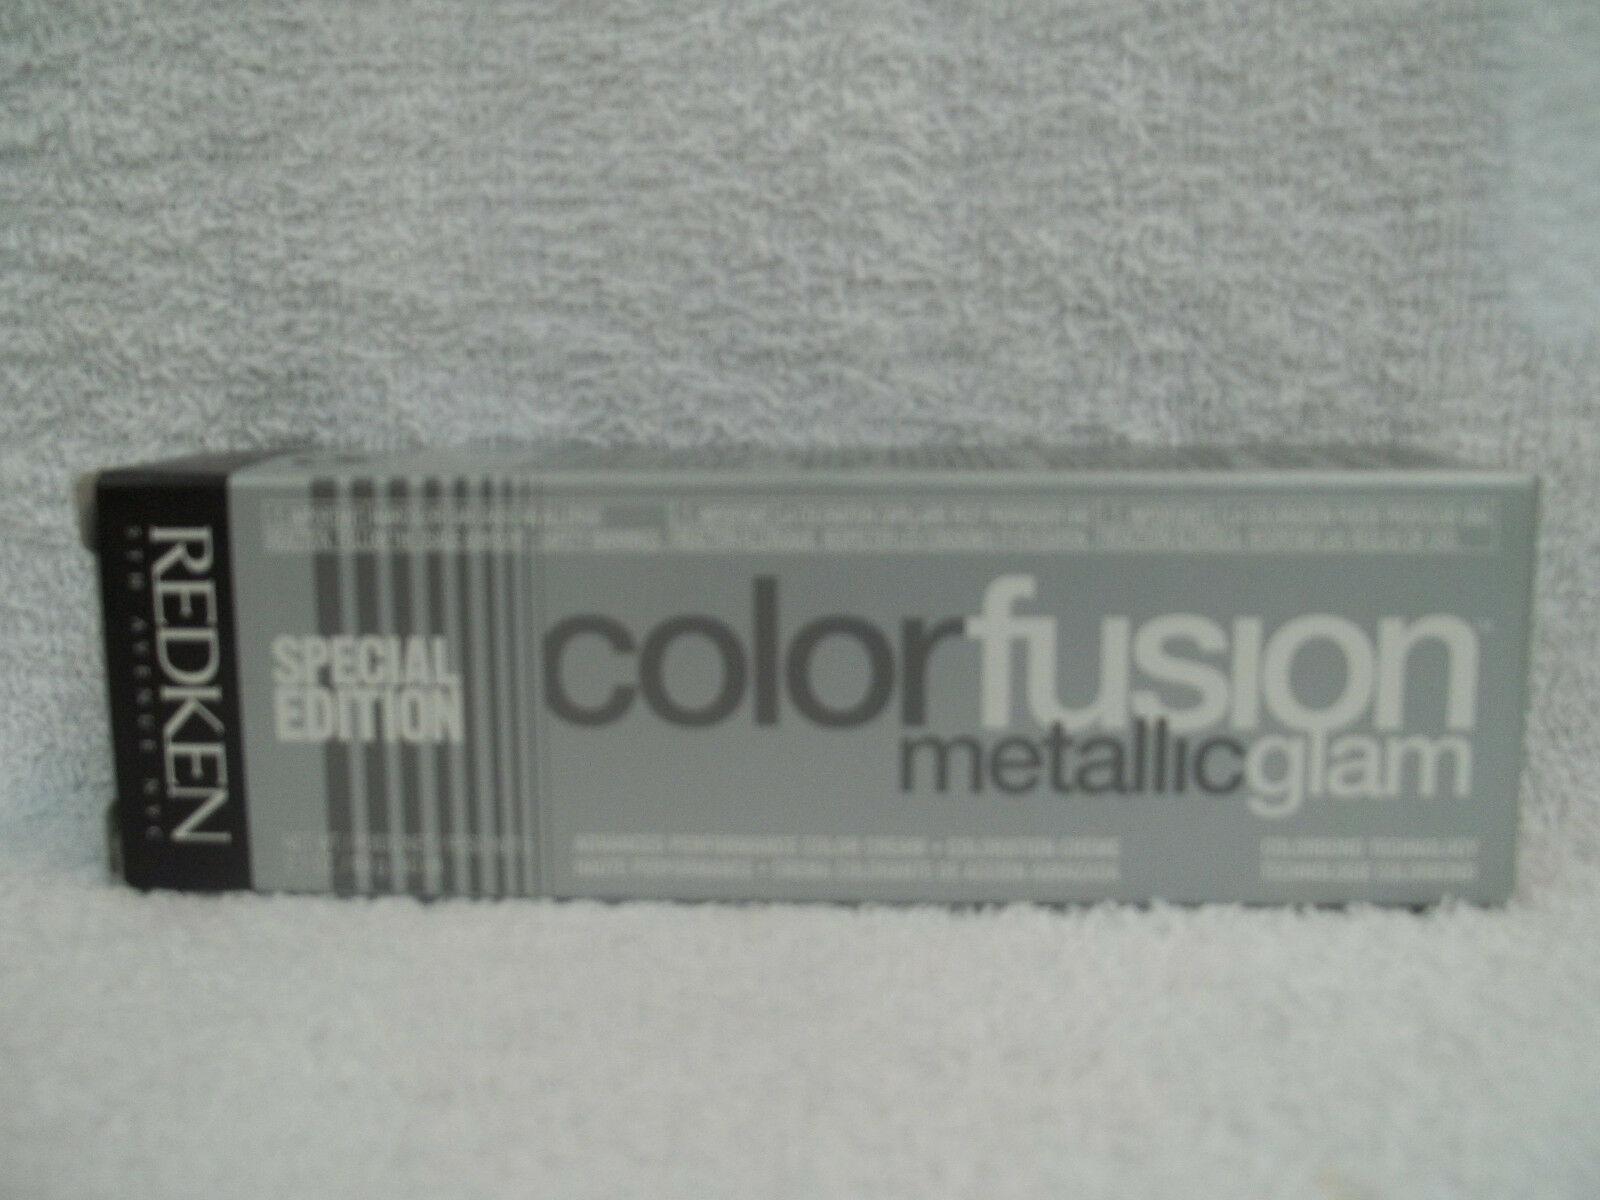 REDKEN Color Fusion METALLIC GLAM Professional Cream Hair Color ~U Pick~ 2 oz!!! - $5.58 - $11.33